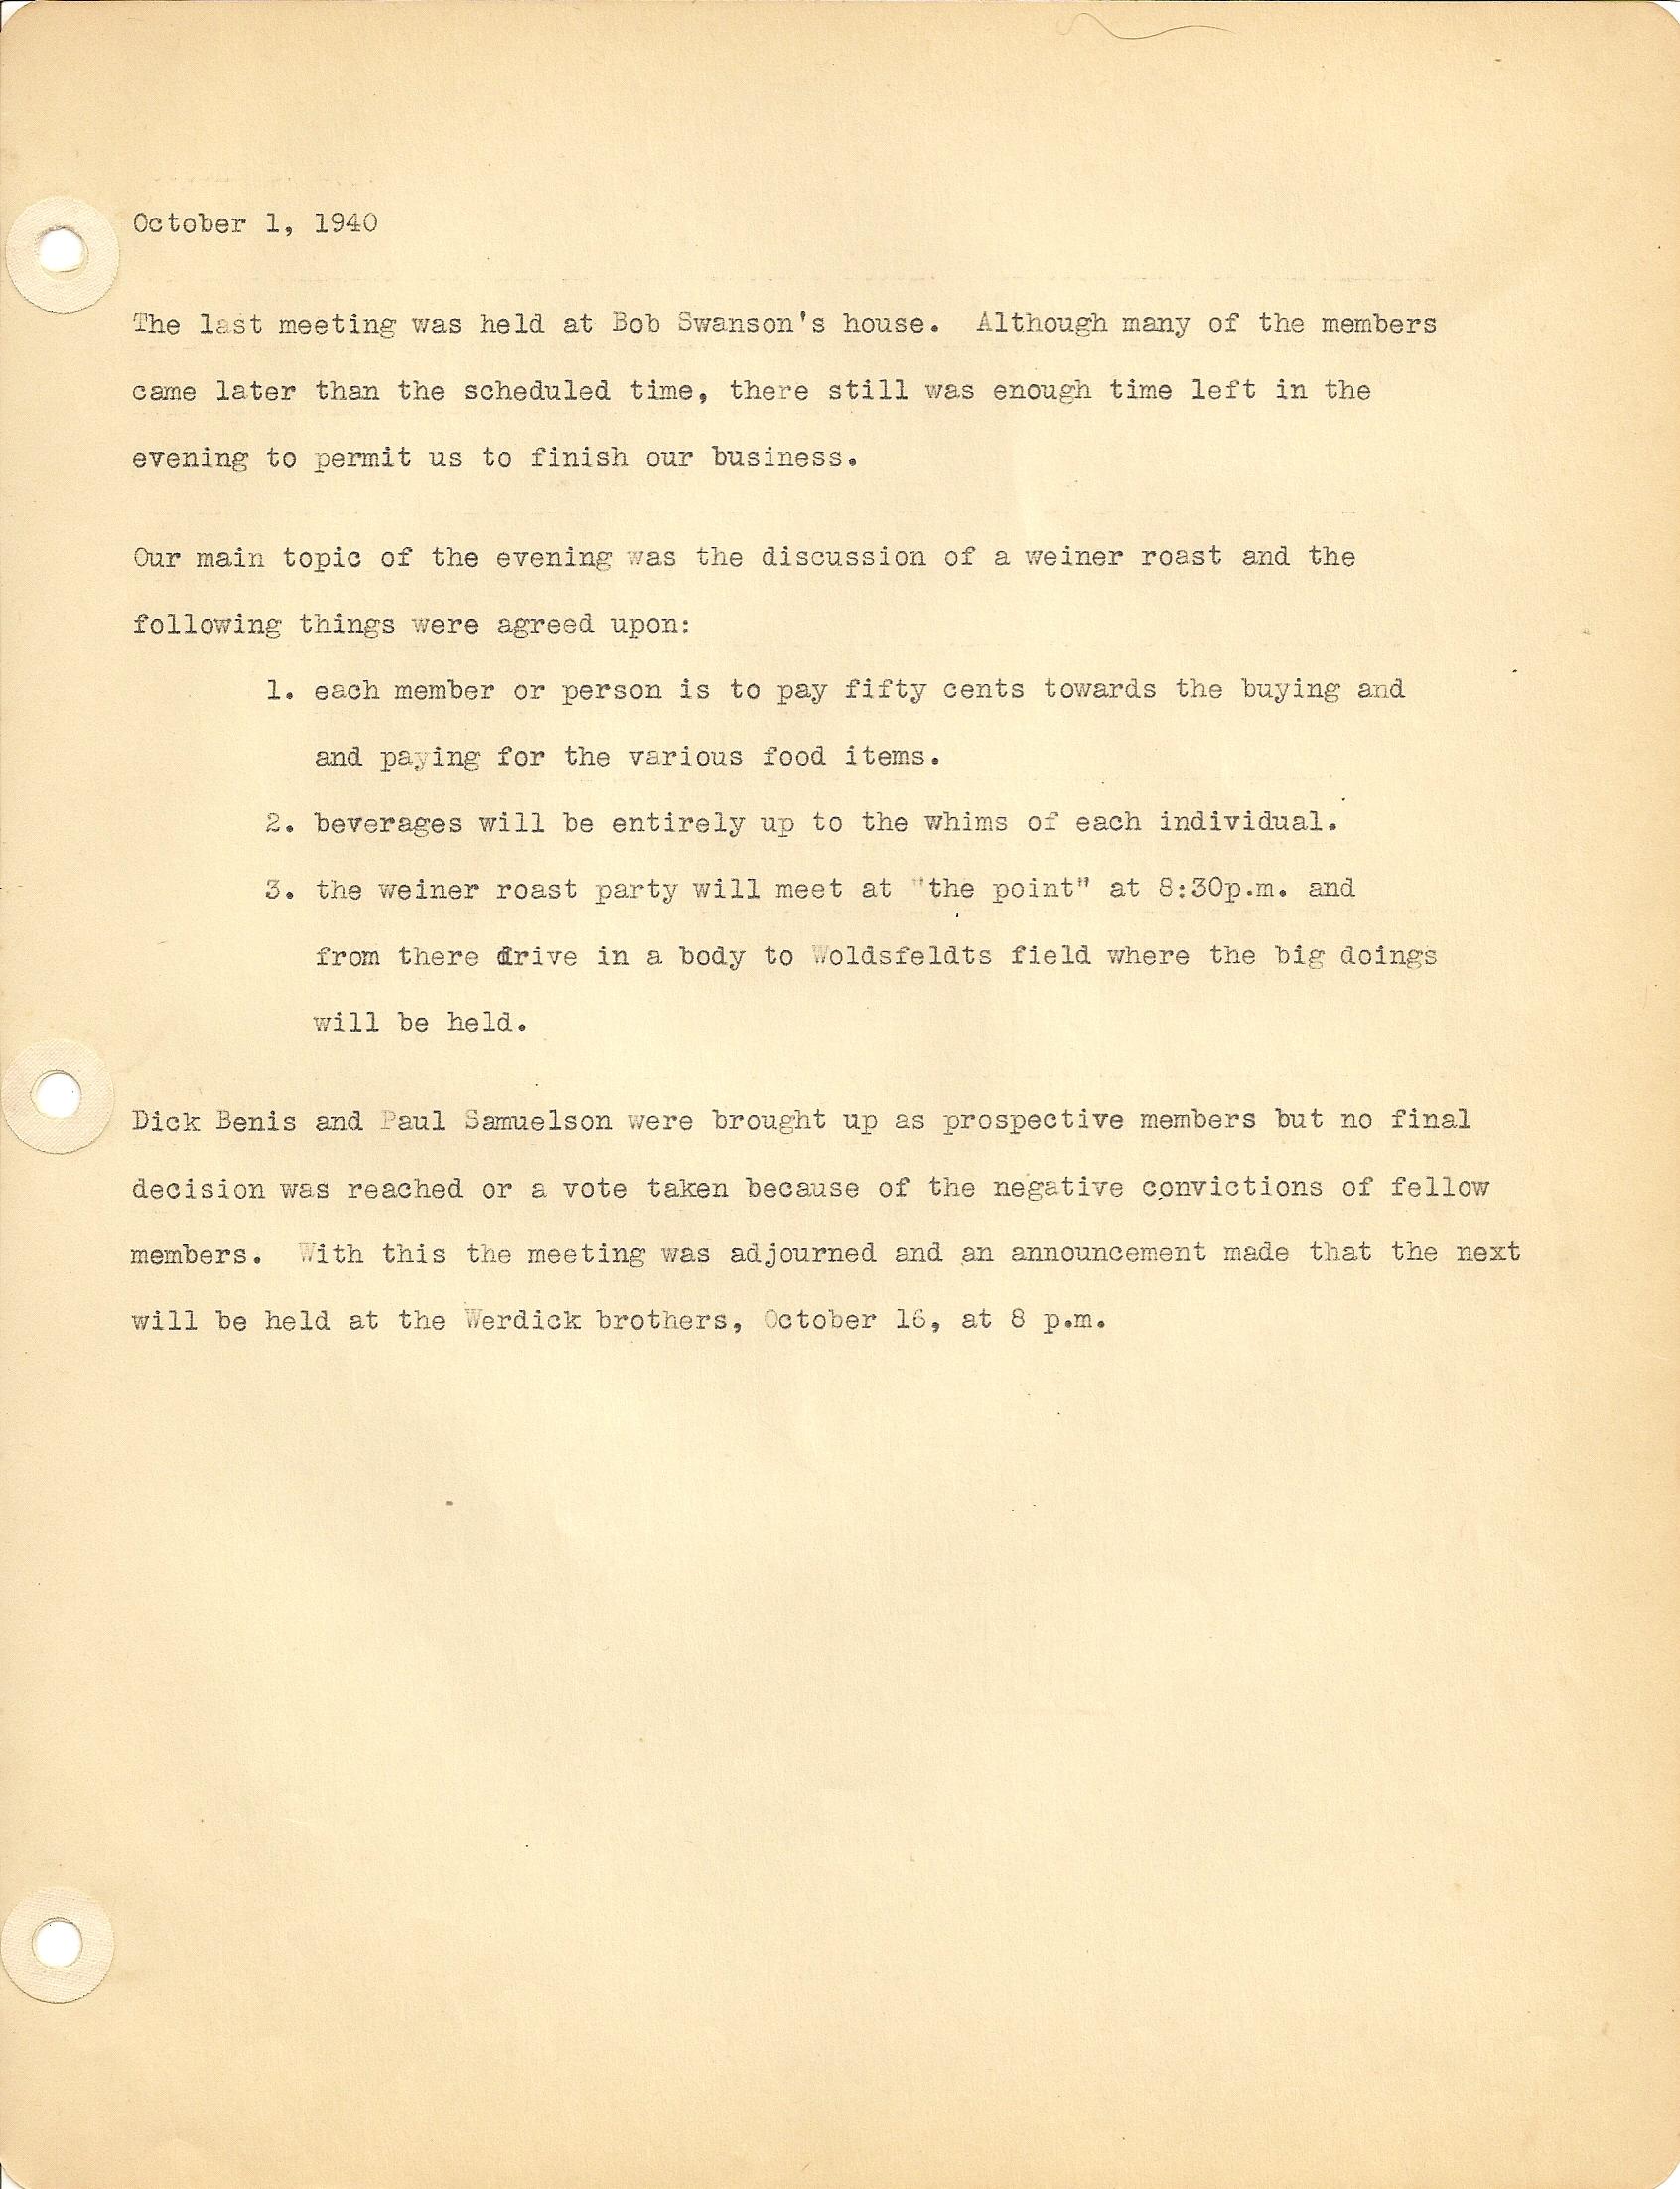 Minutes 10.1.1940.jpg